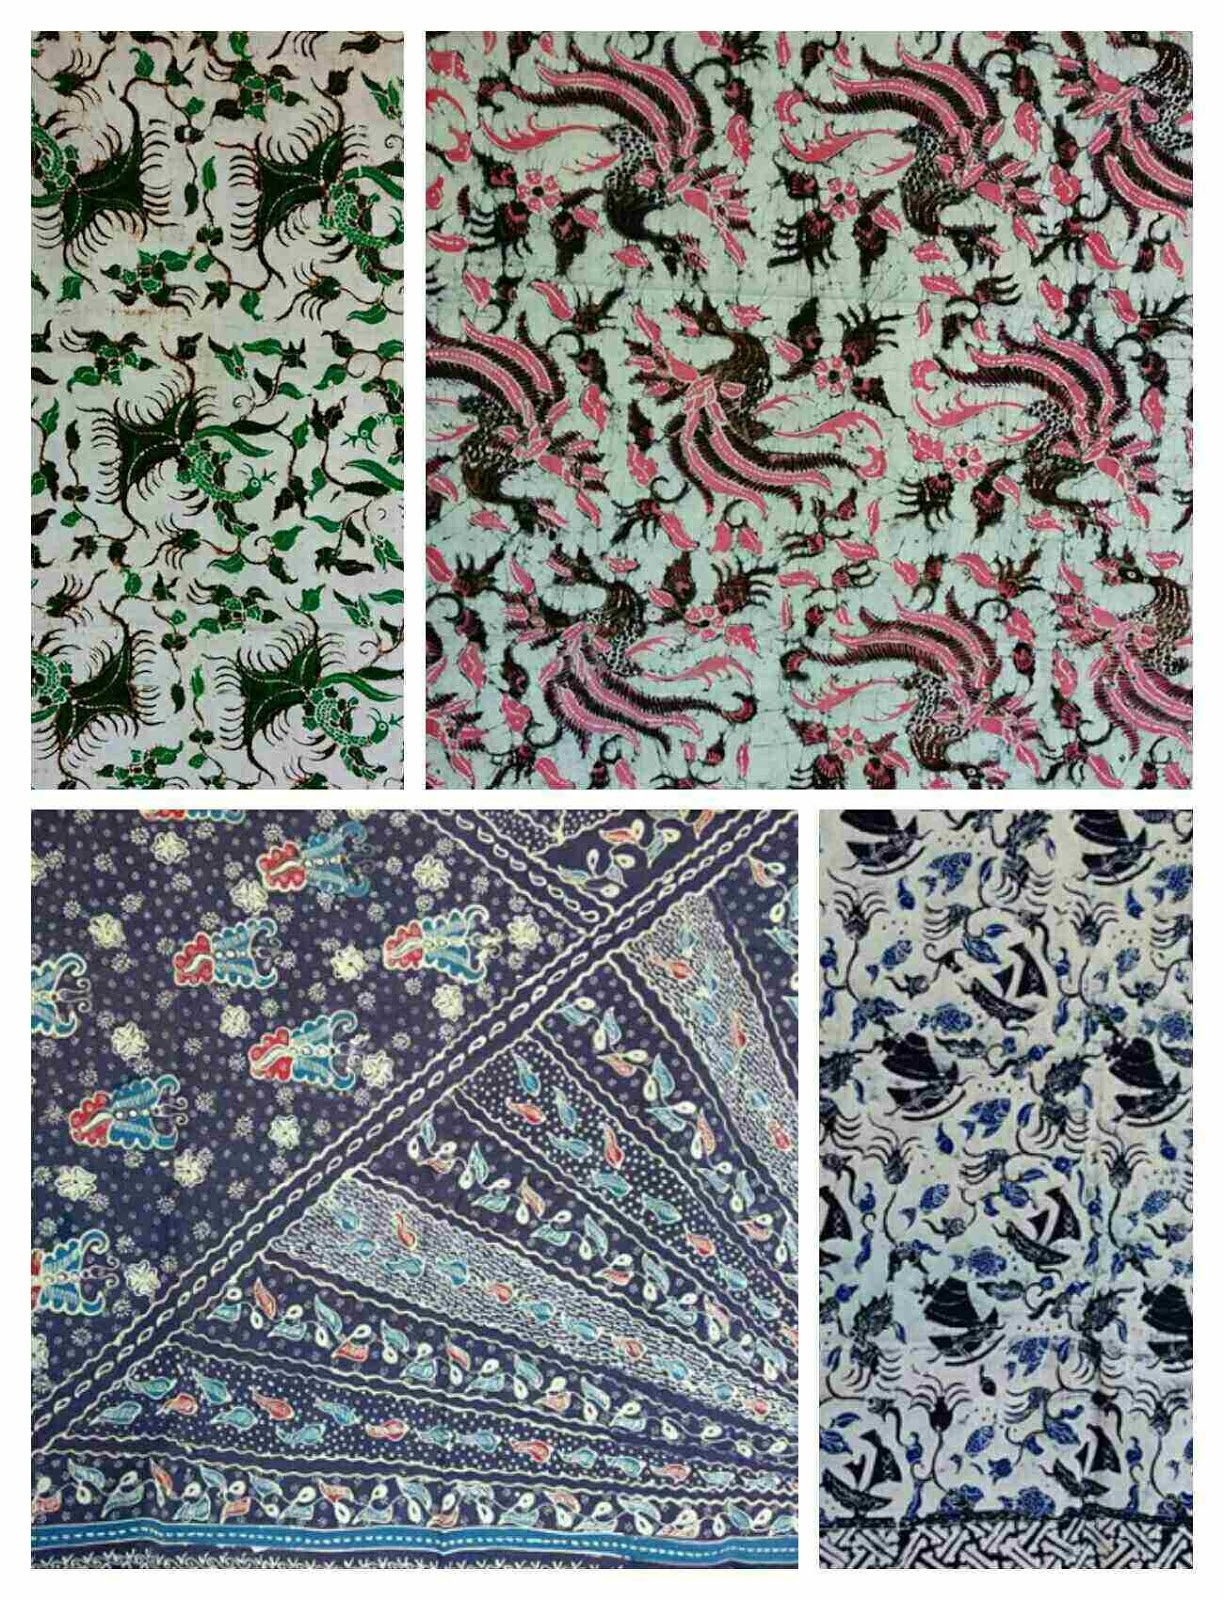 Corak batik gedok